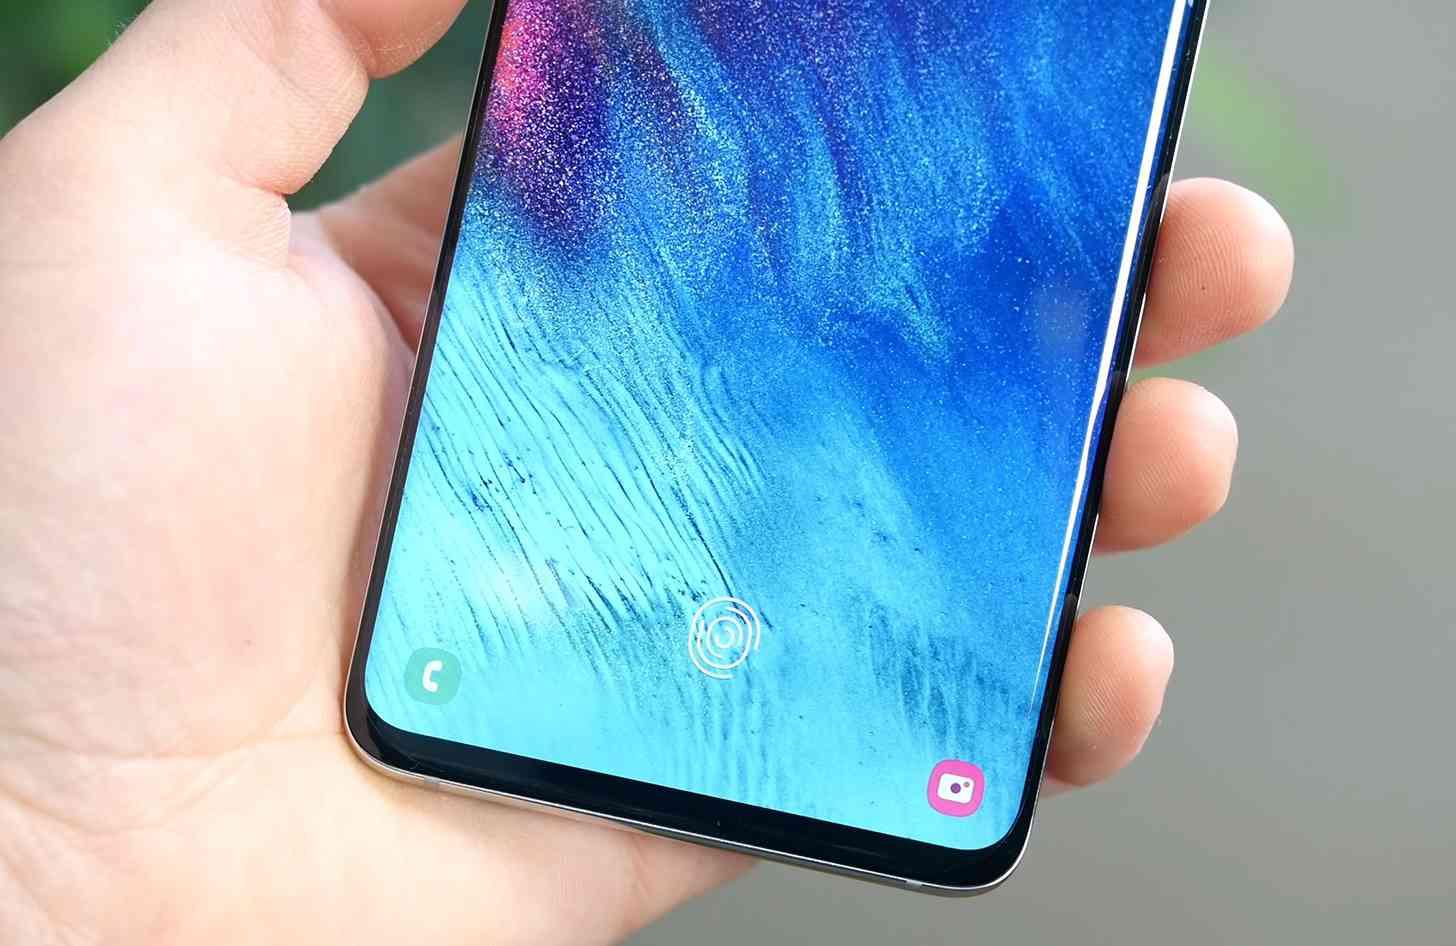 Samsung Galaxy S10 fingerprint sensor